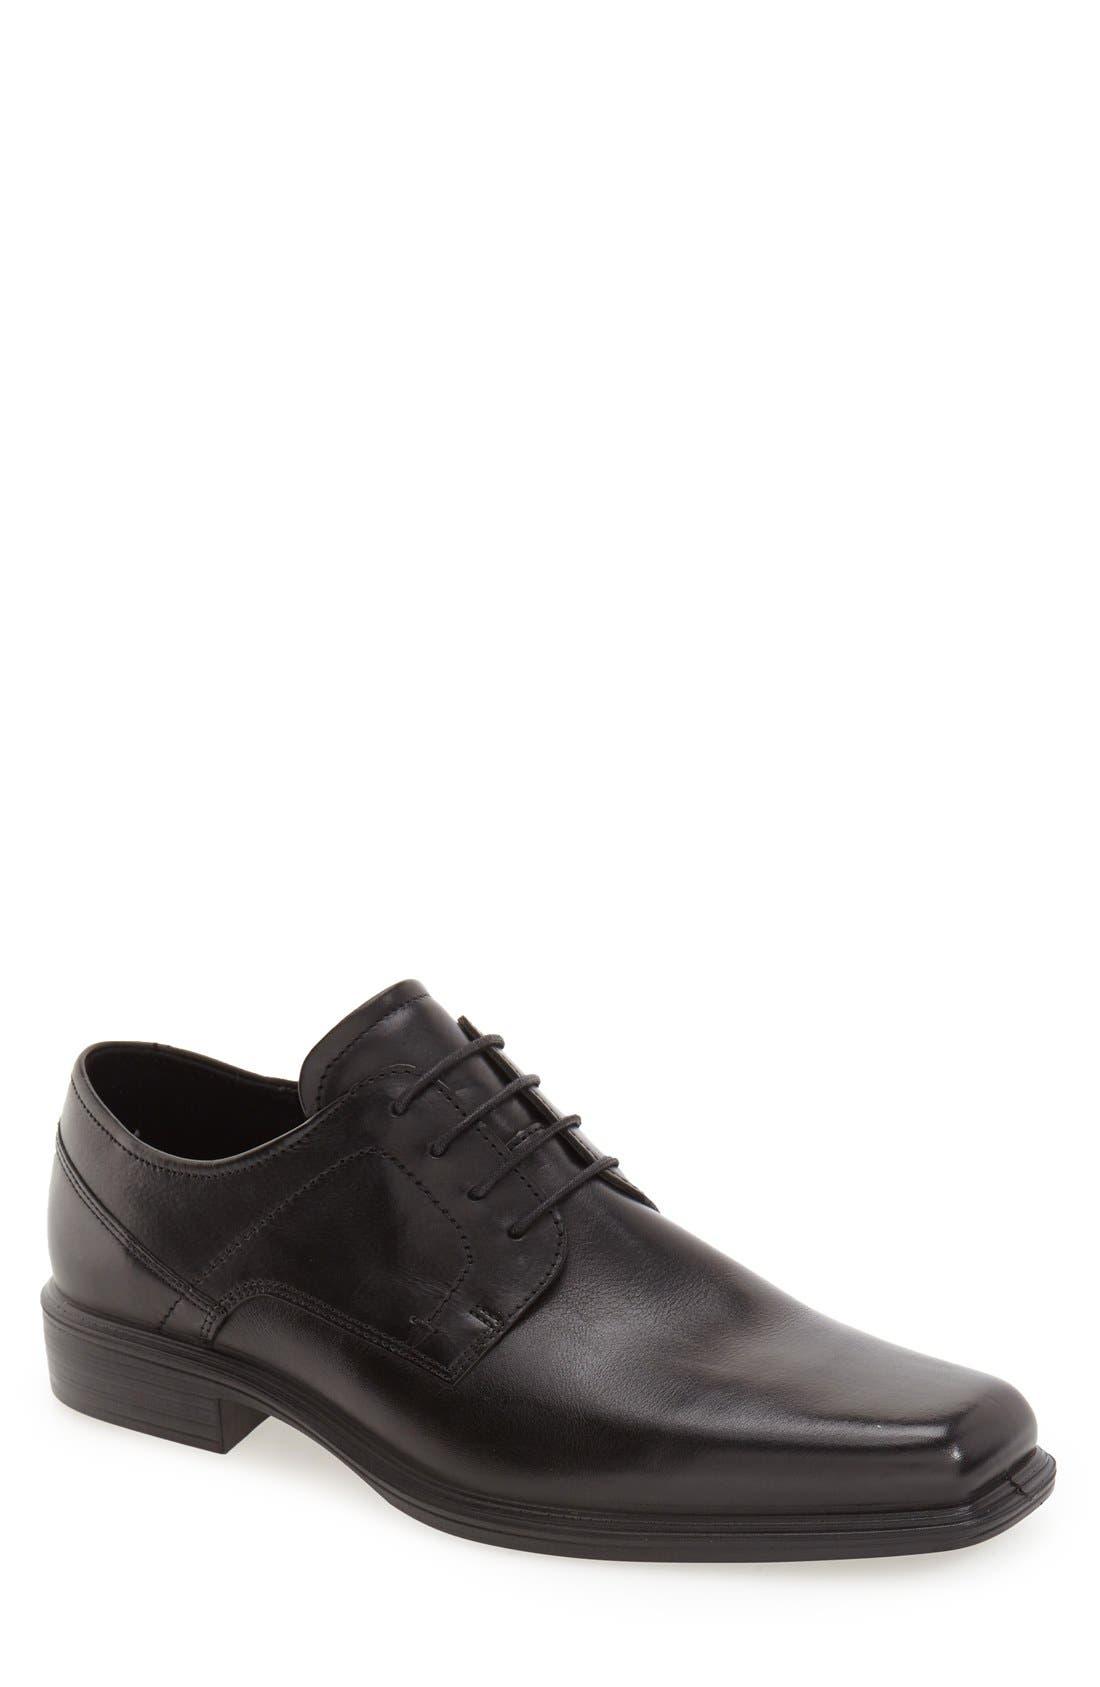 'Johannesburg' Plain Toe Derby,                             Main thumbnail 1, color,                             Black Leather